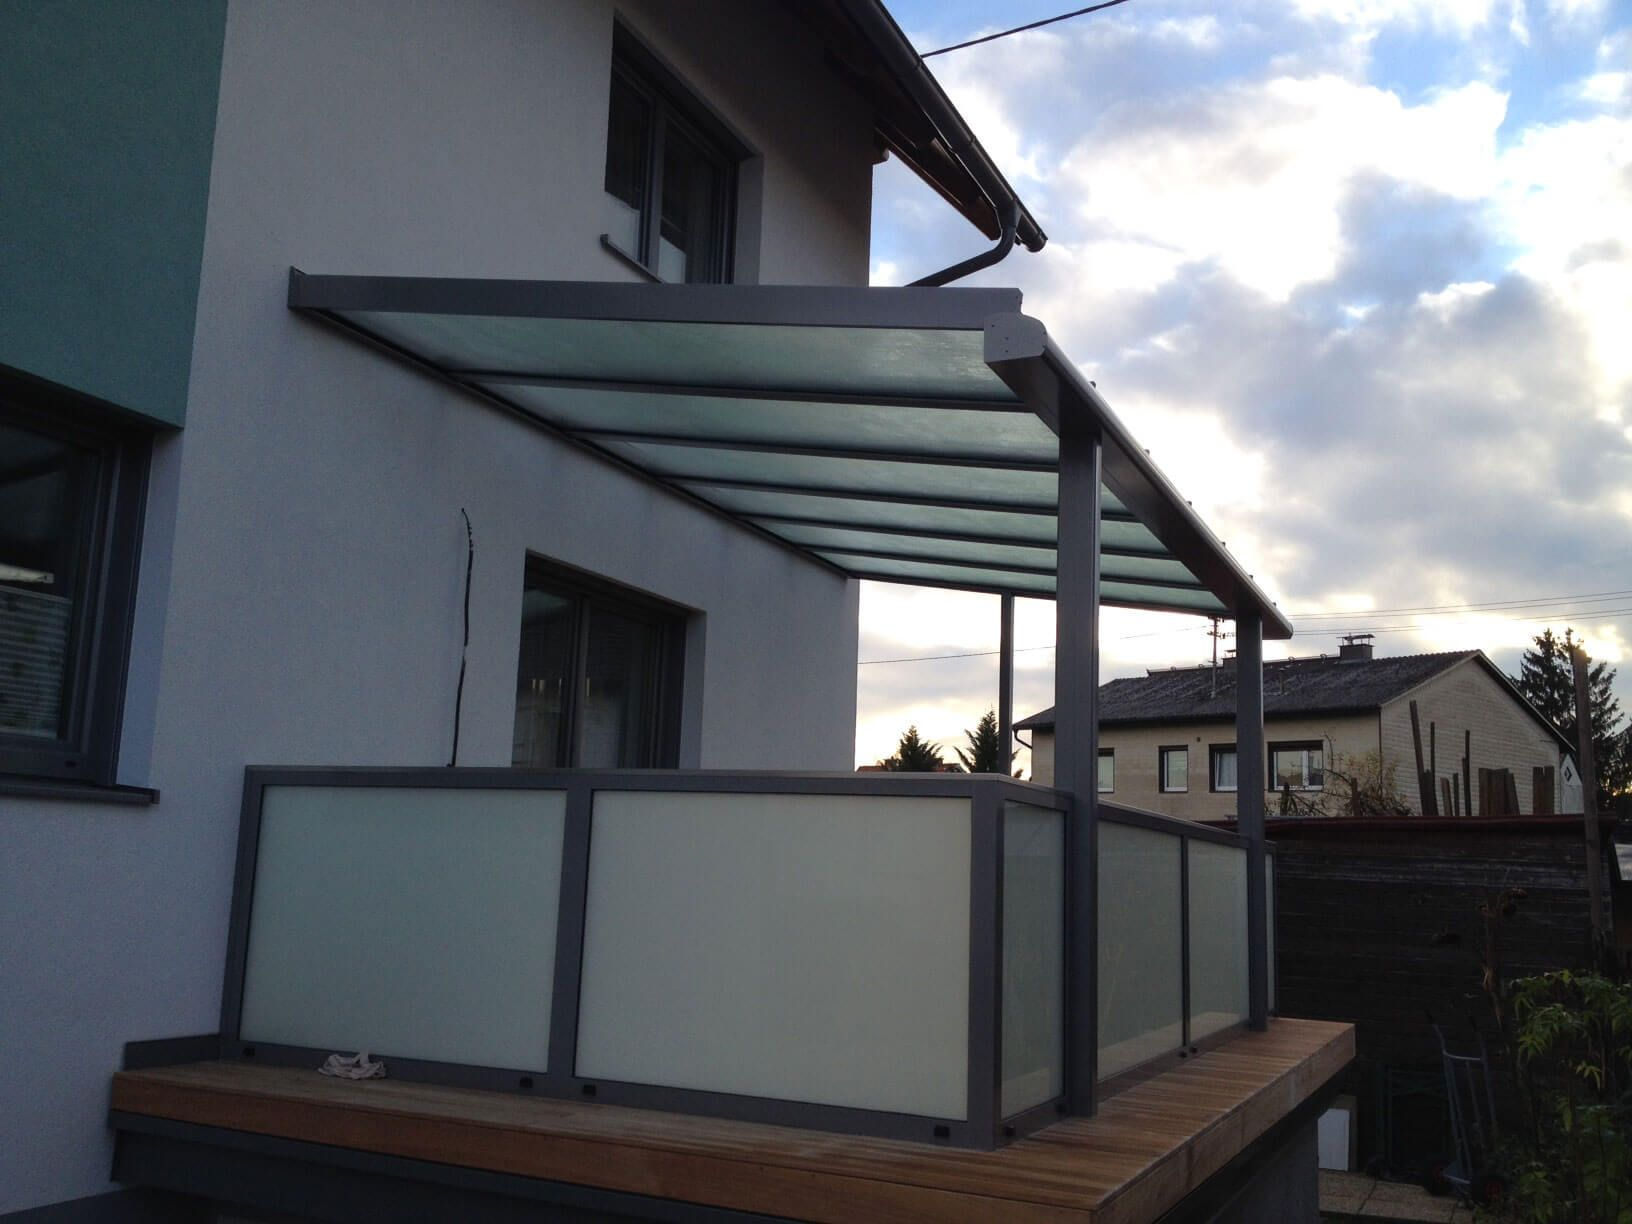 anthrazit graue terrassenüberdachung | balkon, Hause deko